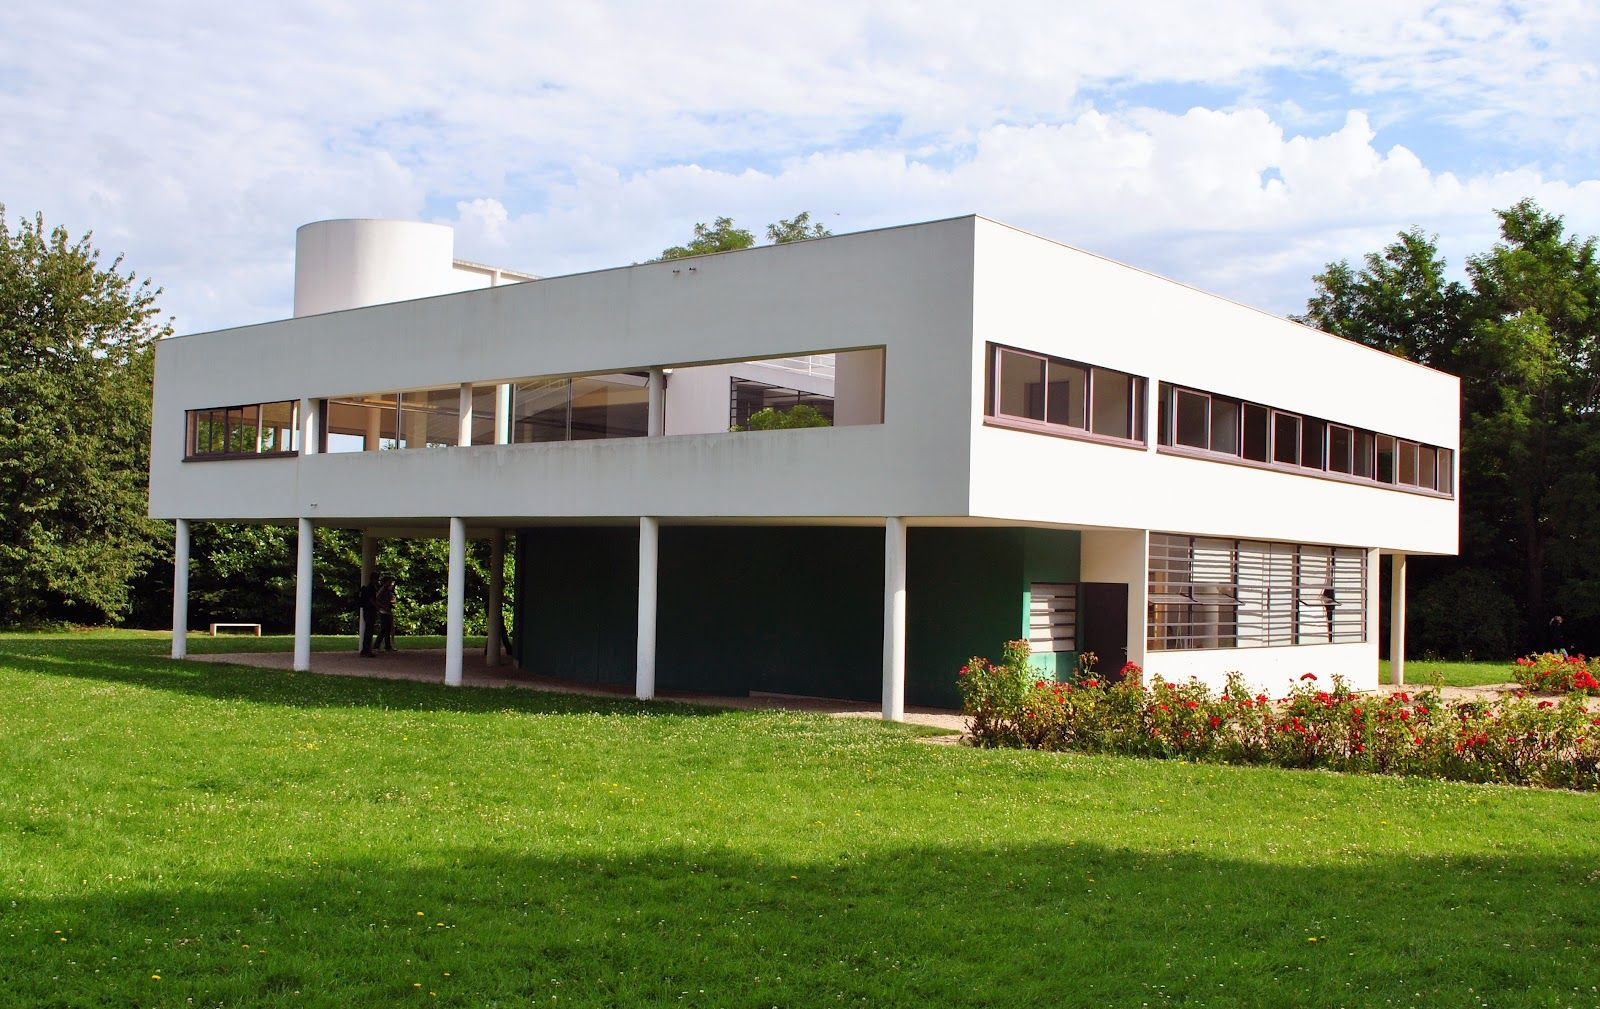 villa savoye le corbusier pinterest le corbusier. Black Bedroom Furniture Sets. Home Design Ideas